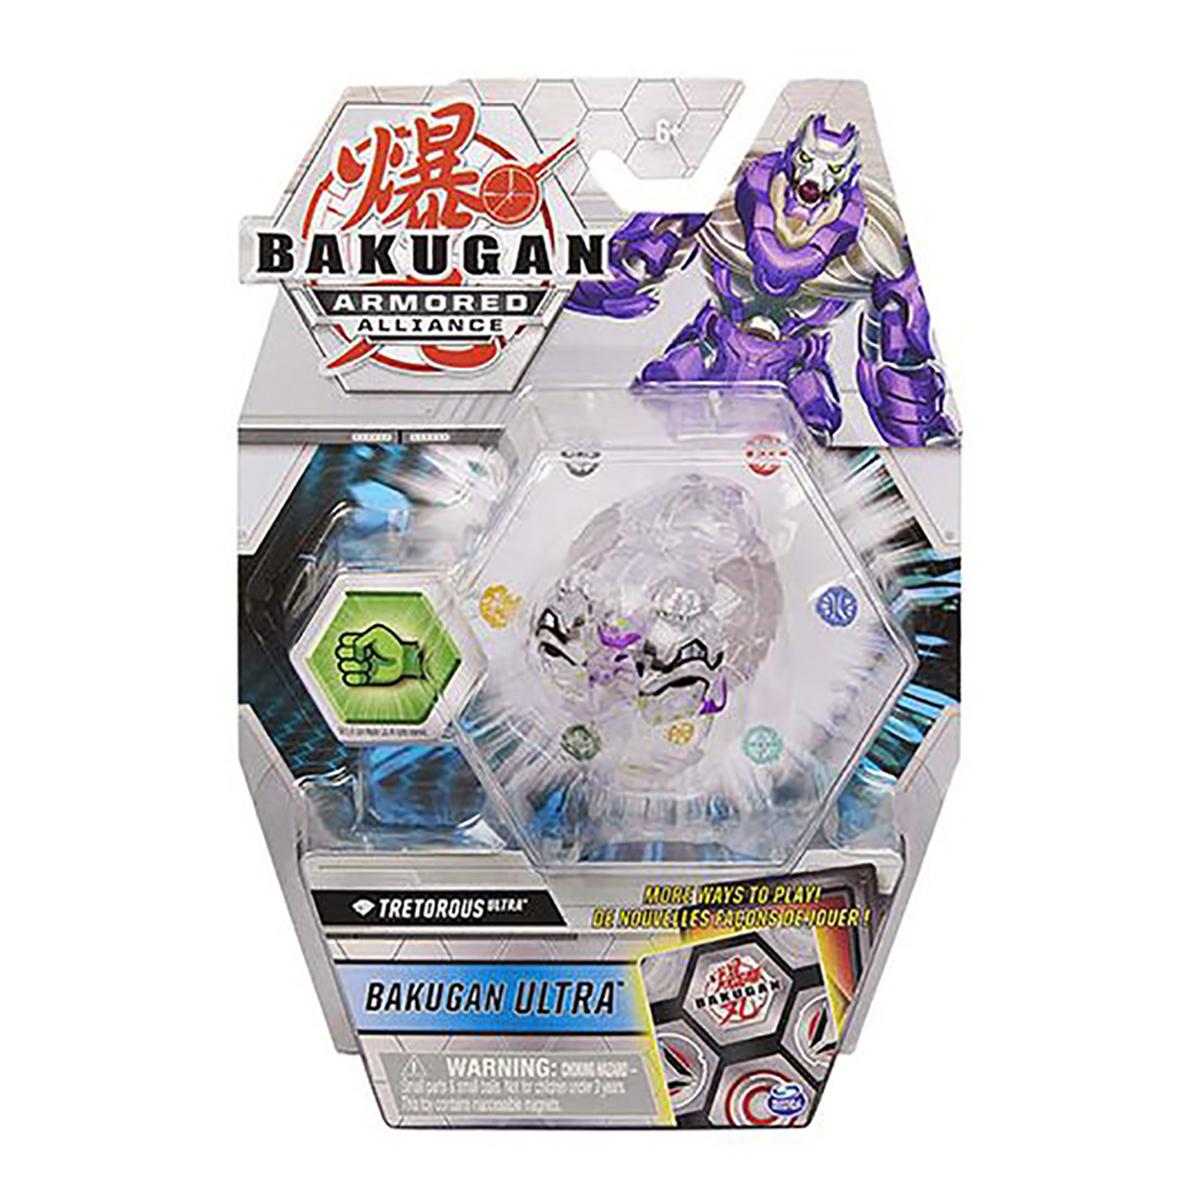 Figurina Bakugan Ultra Armored Alliance, Tretorous, 20124621